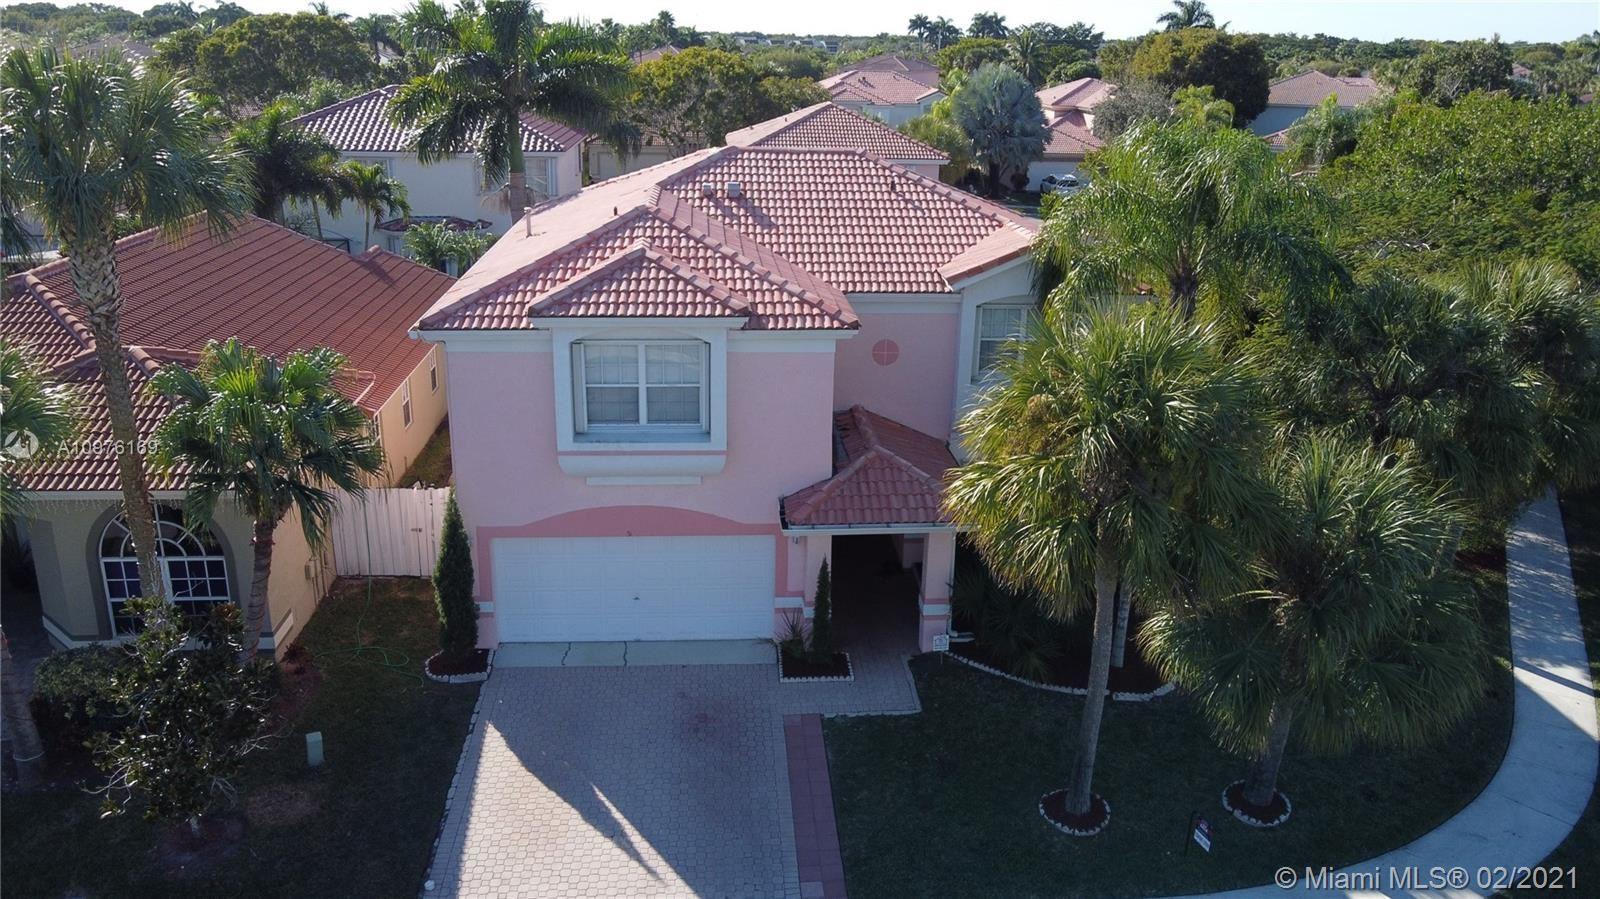 51 Gables Blvd, Weston, FL 33326 - #: A10976169